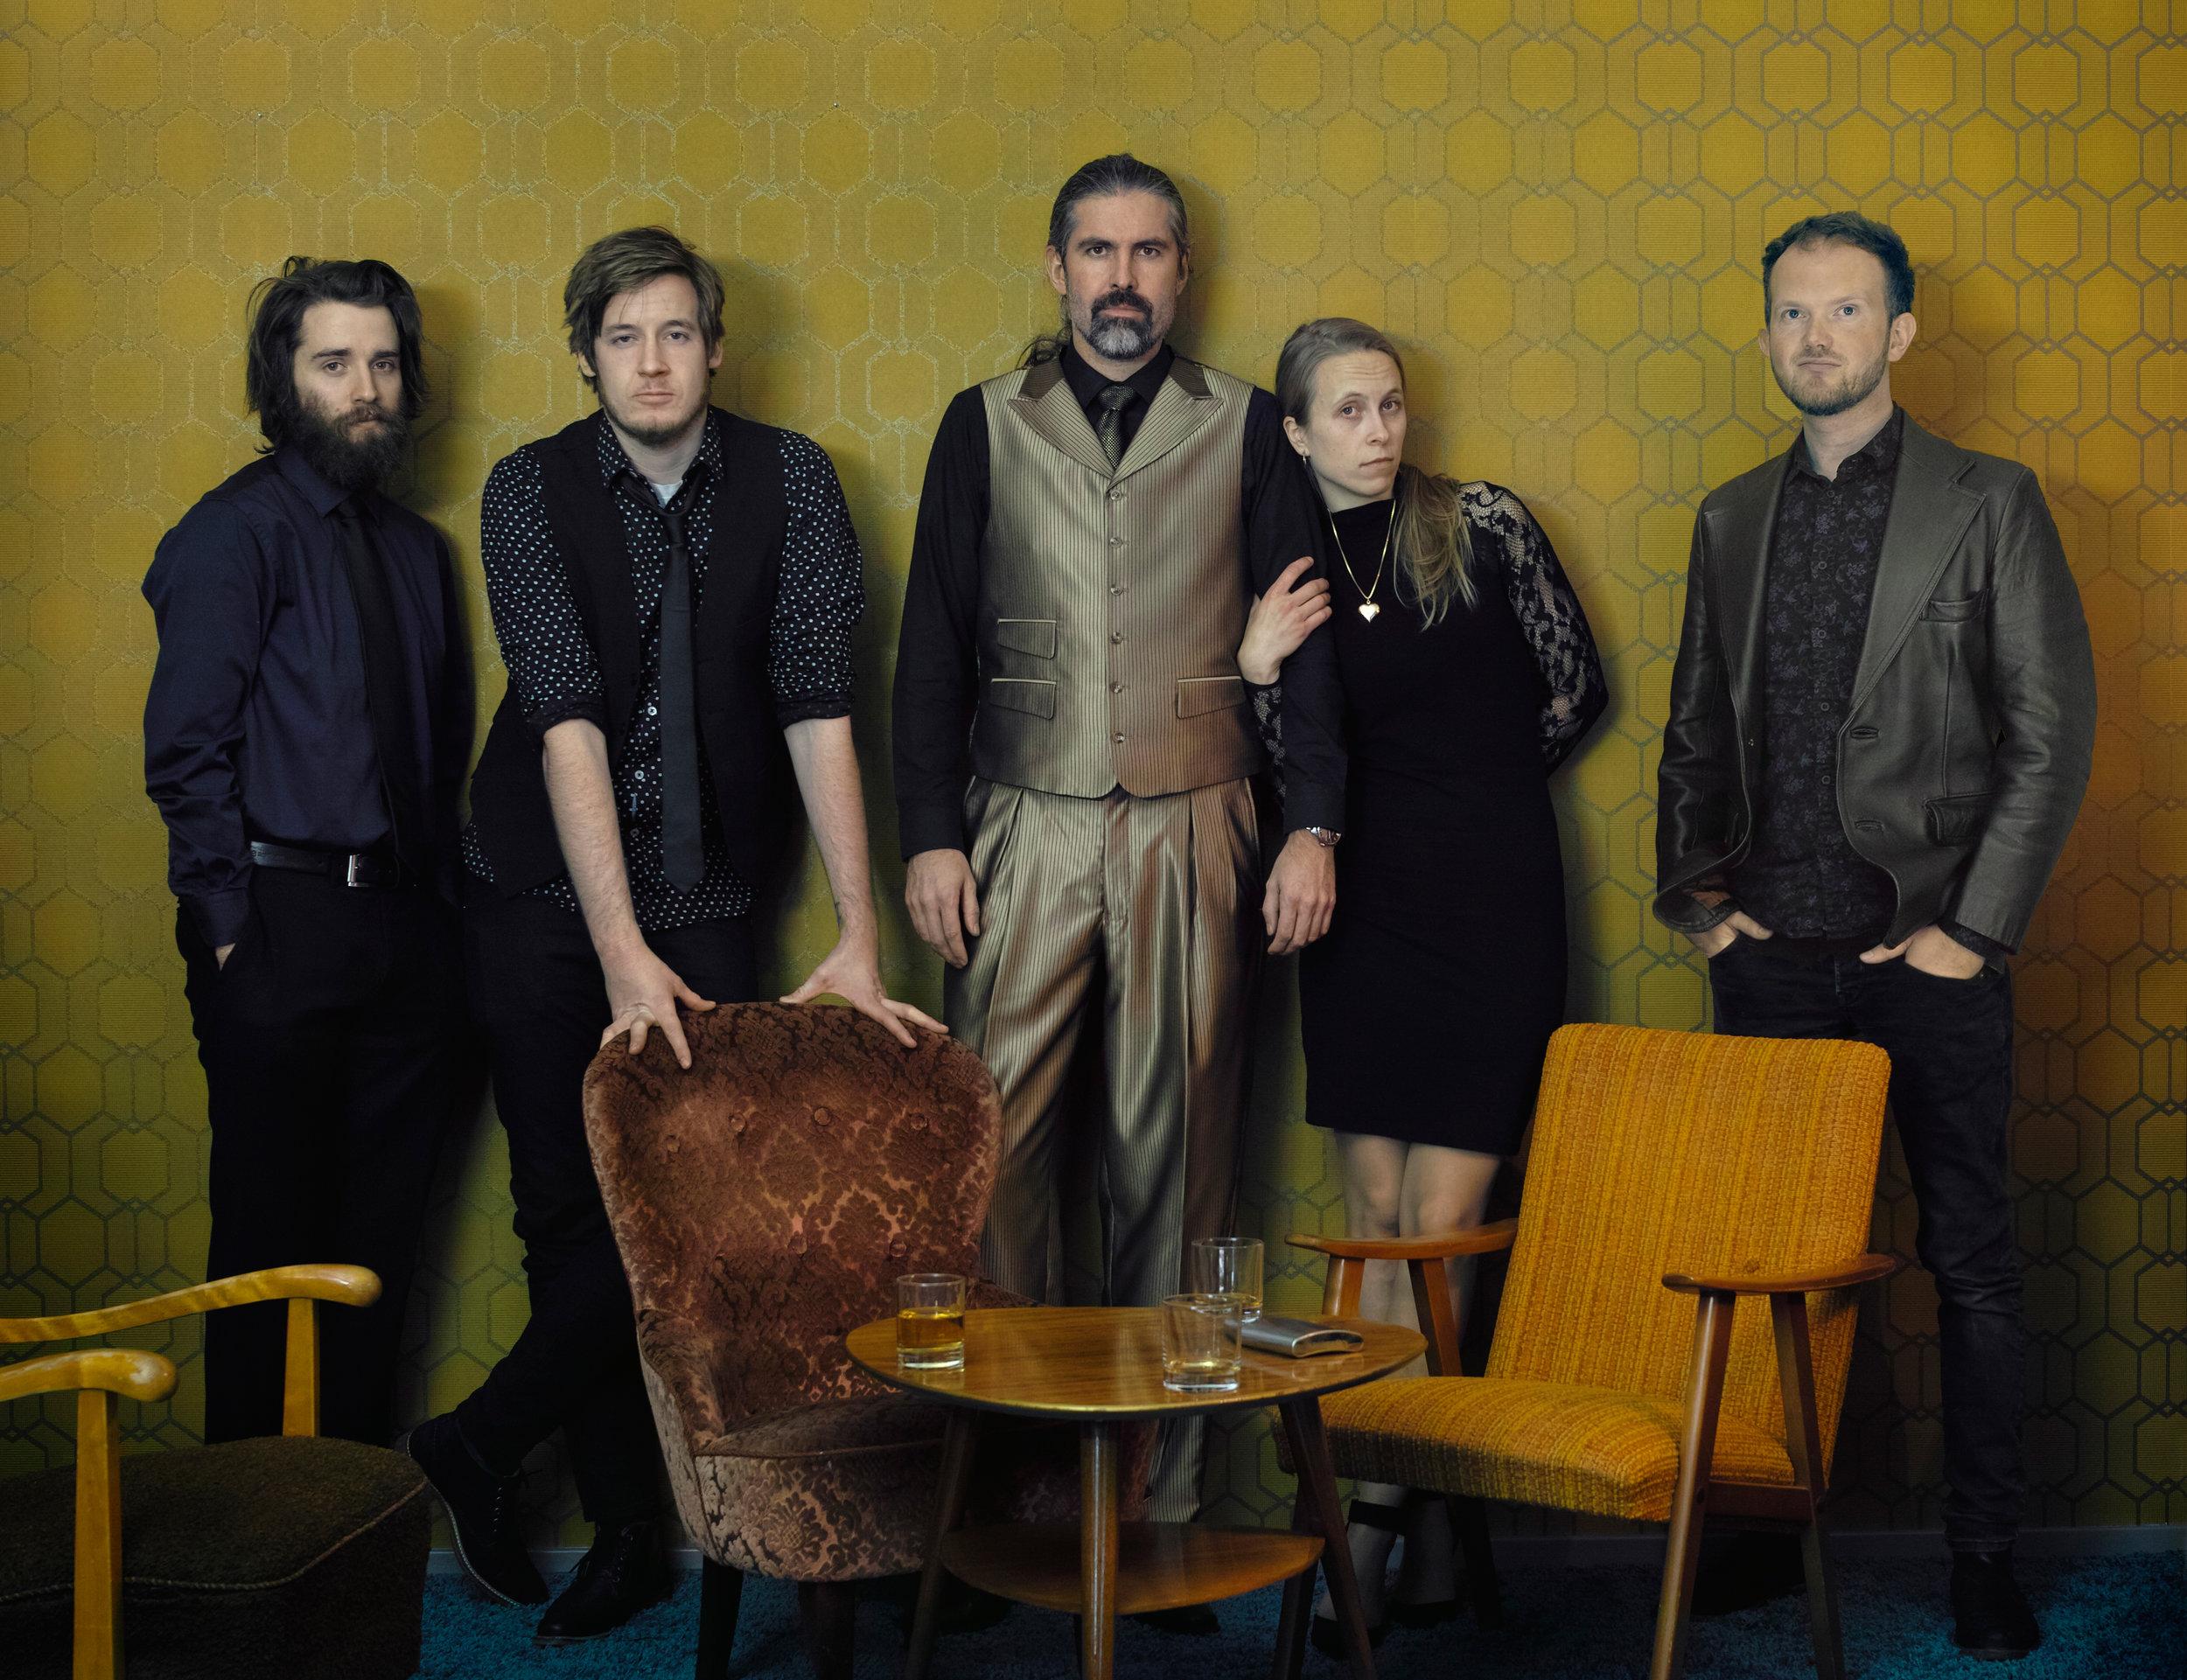 Photo: Roald Sundal Photo manipulation: Anders Brostory From left: Lars Håvard Birkenes, Knut Heggdal, Vidar Vedå, Cecilie Anna, Tron Leon